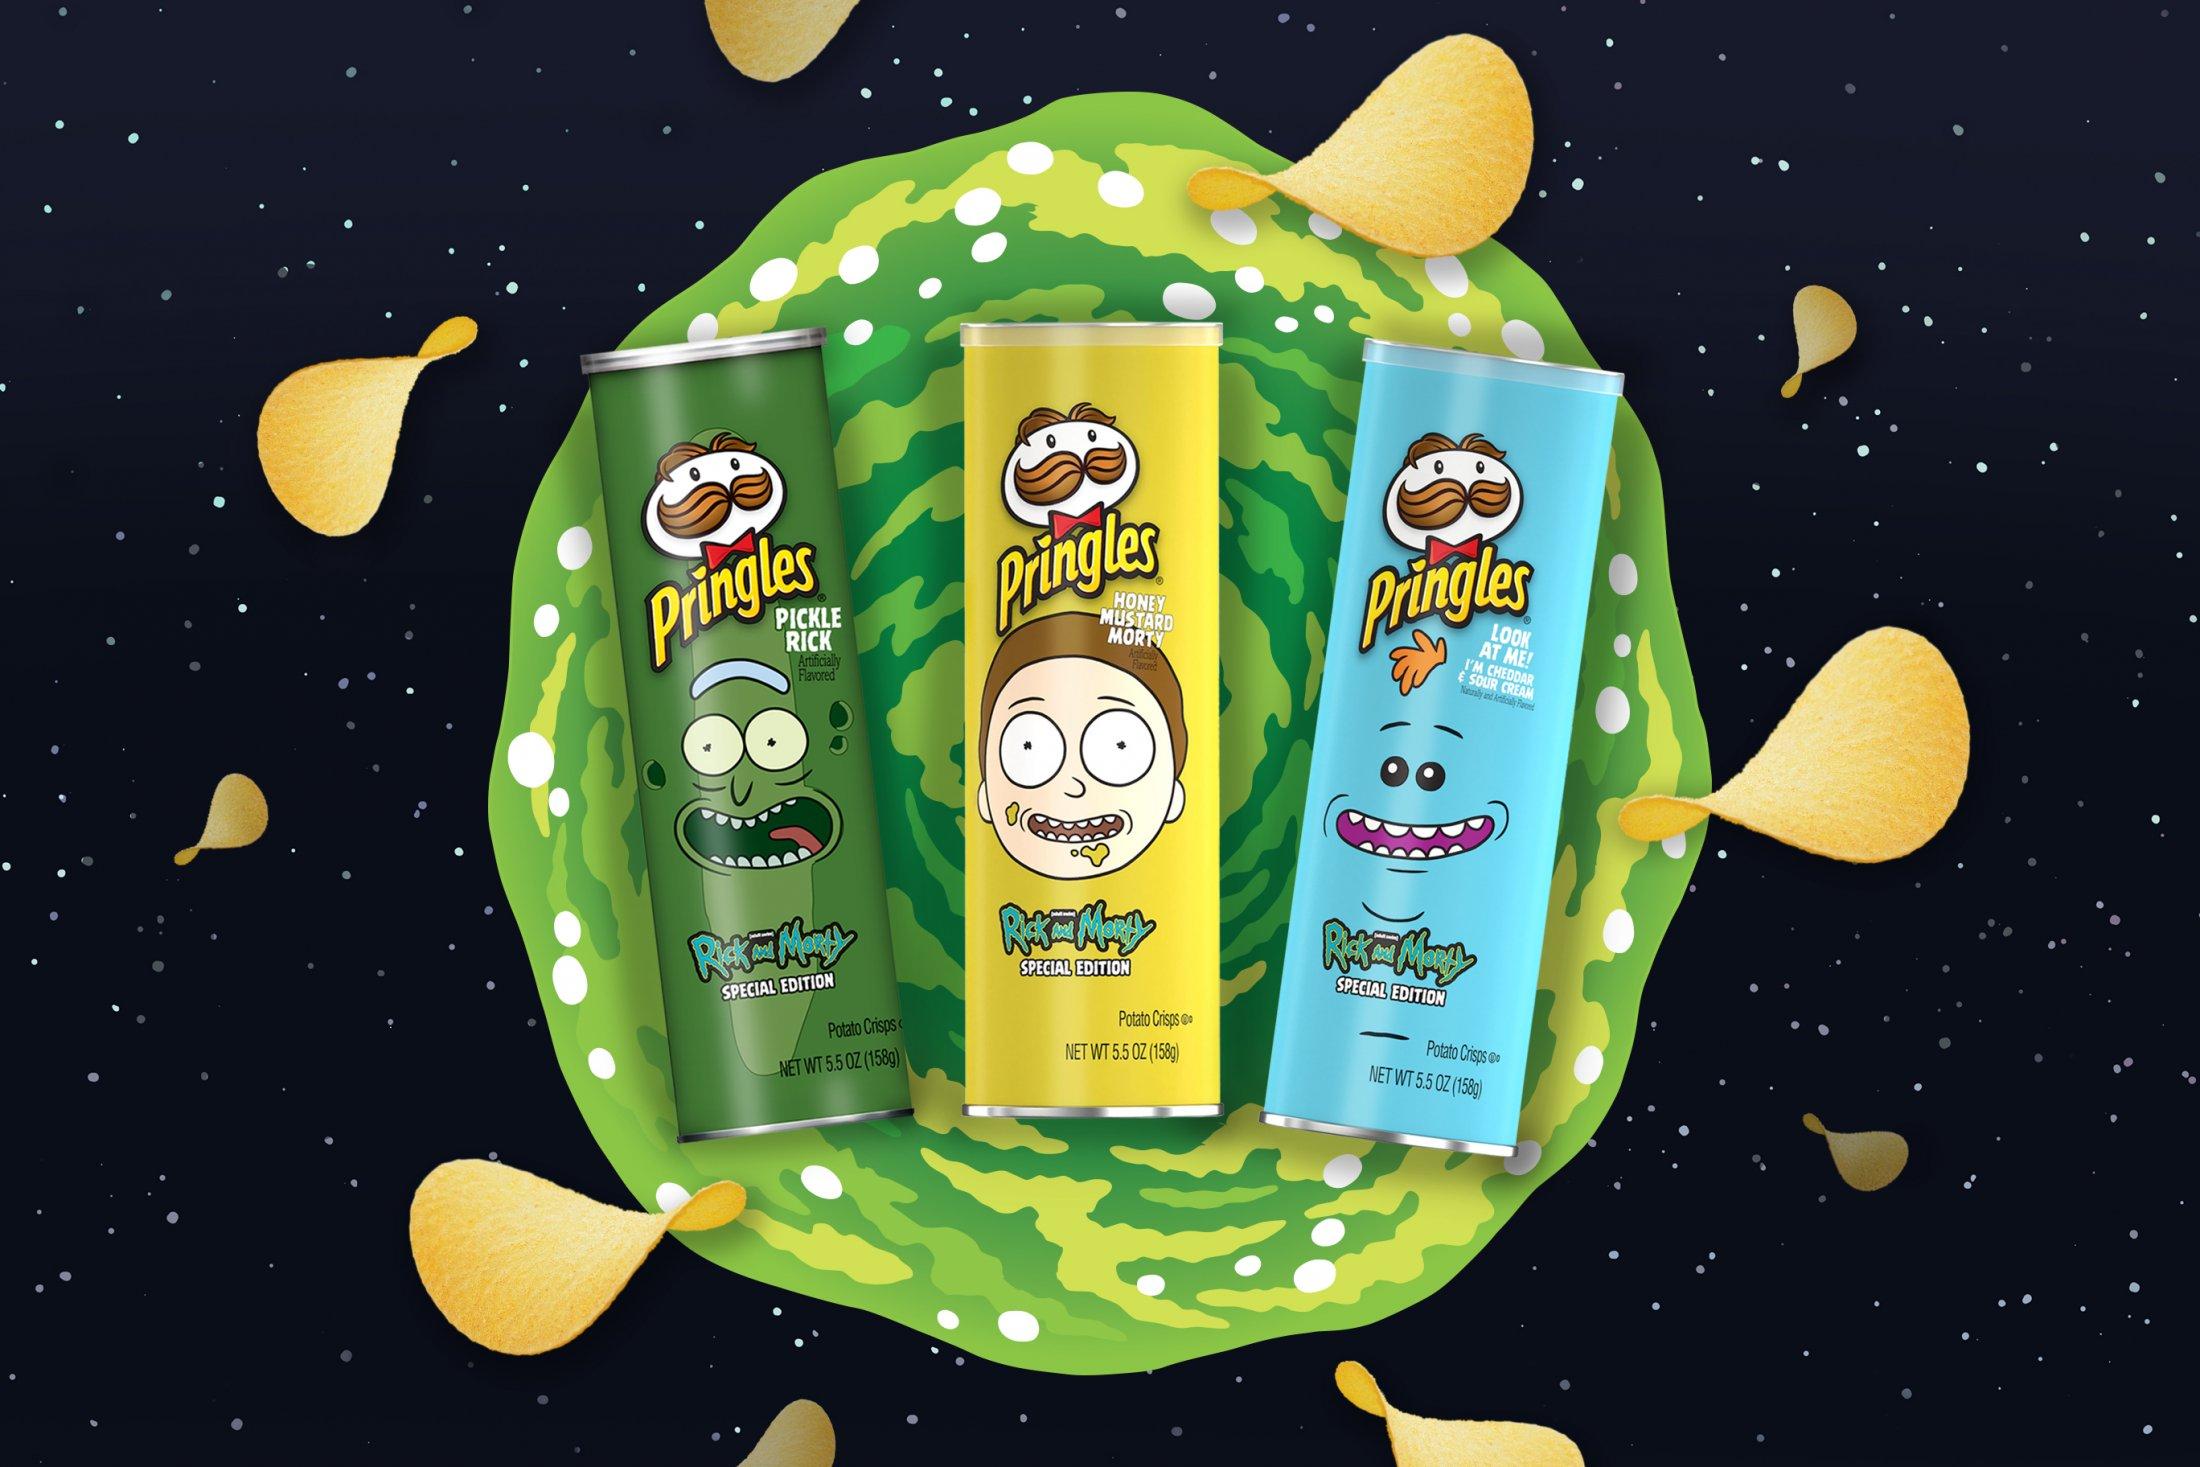 Thumbnail for Rick and Morty and Pringles